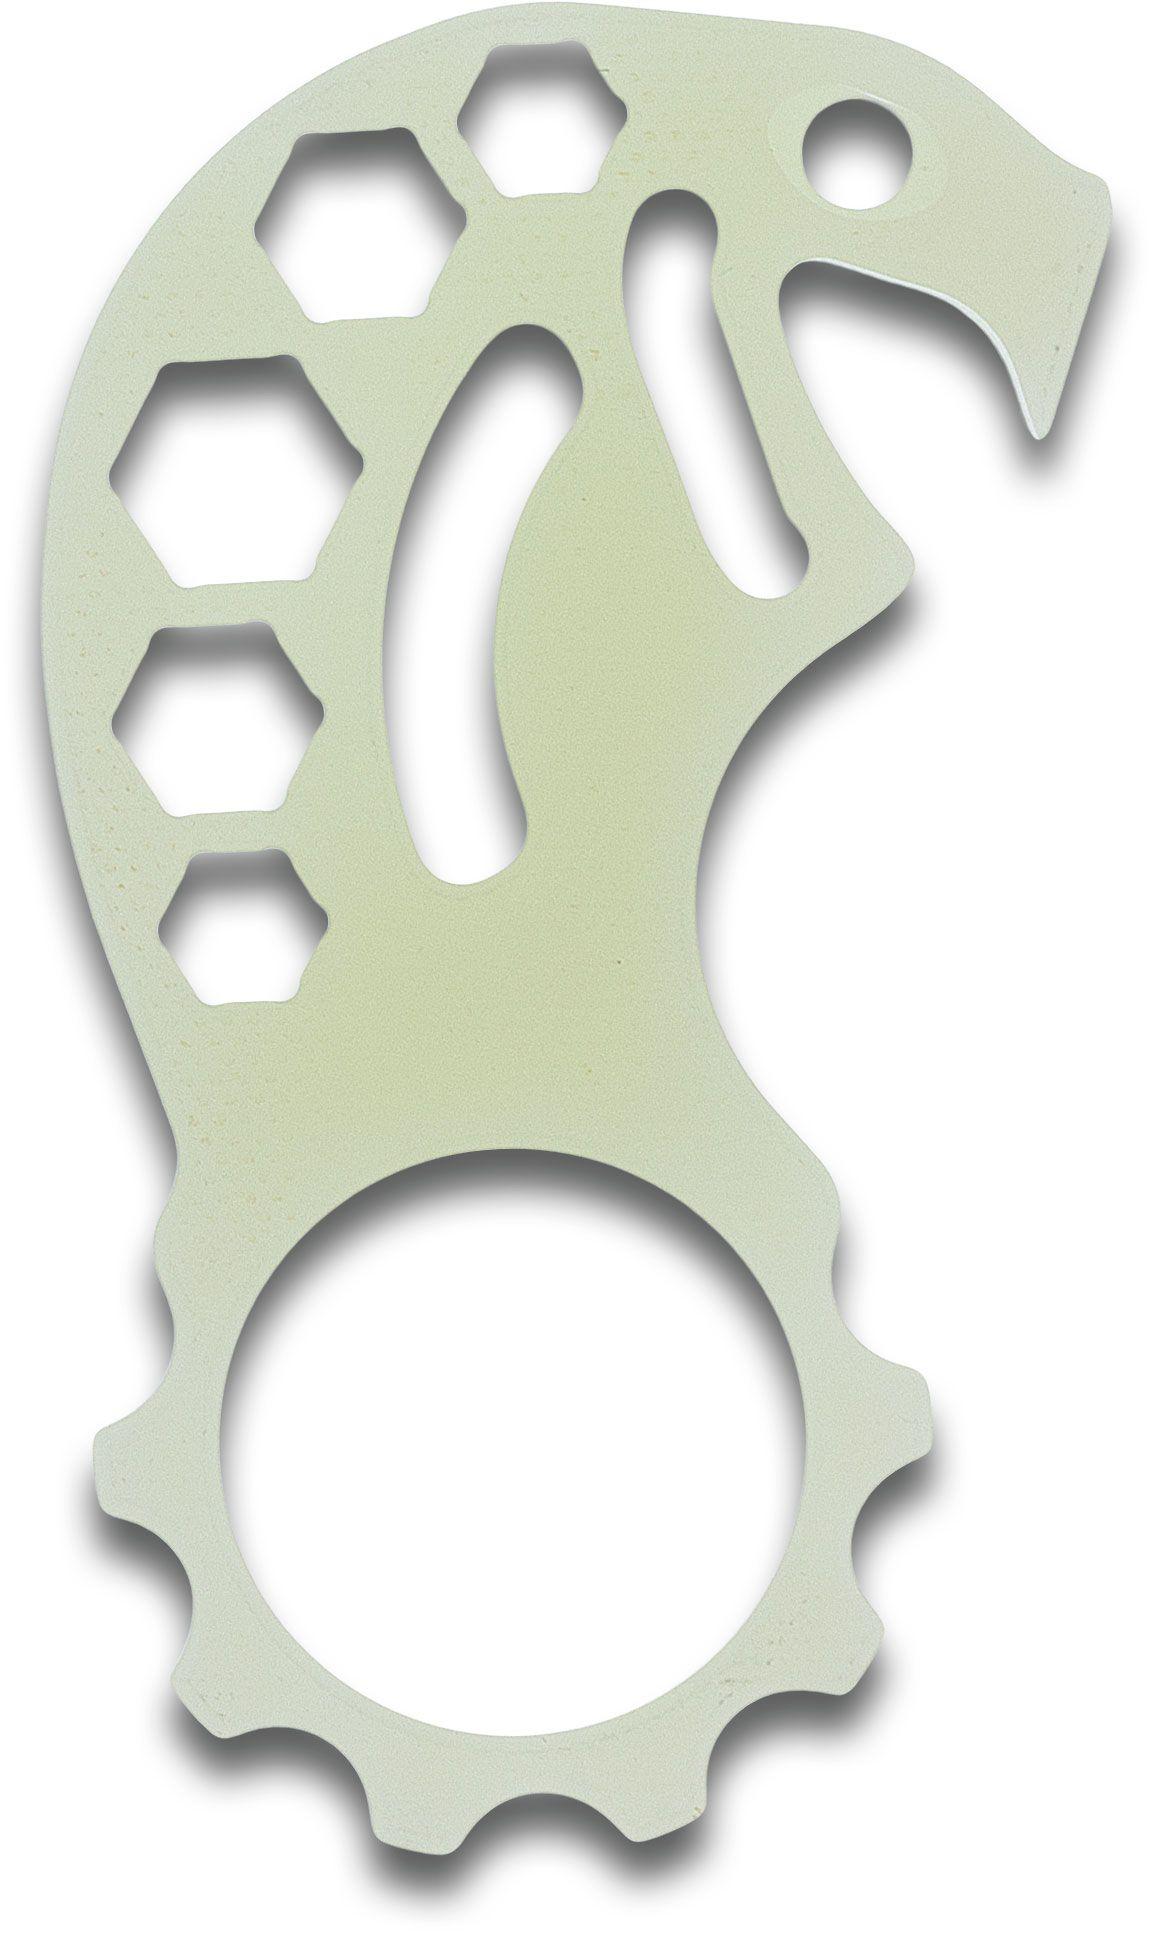 Kobra EDC Tools Natural G10 Kobra Multi-Tool